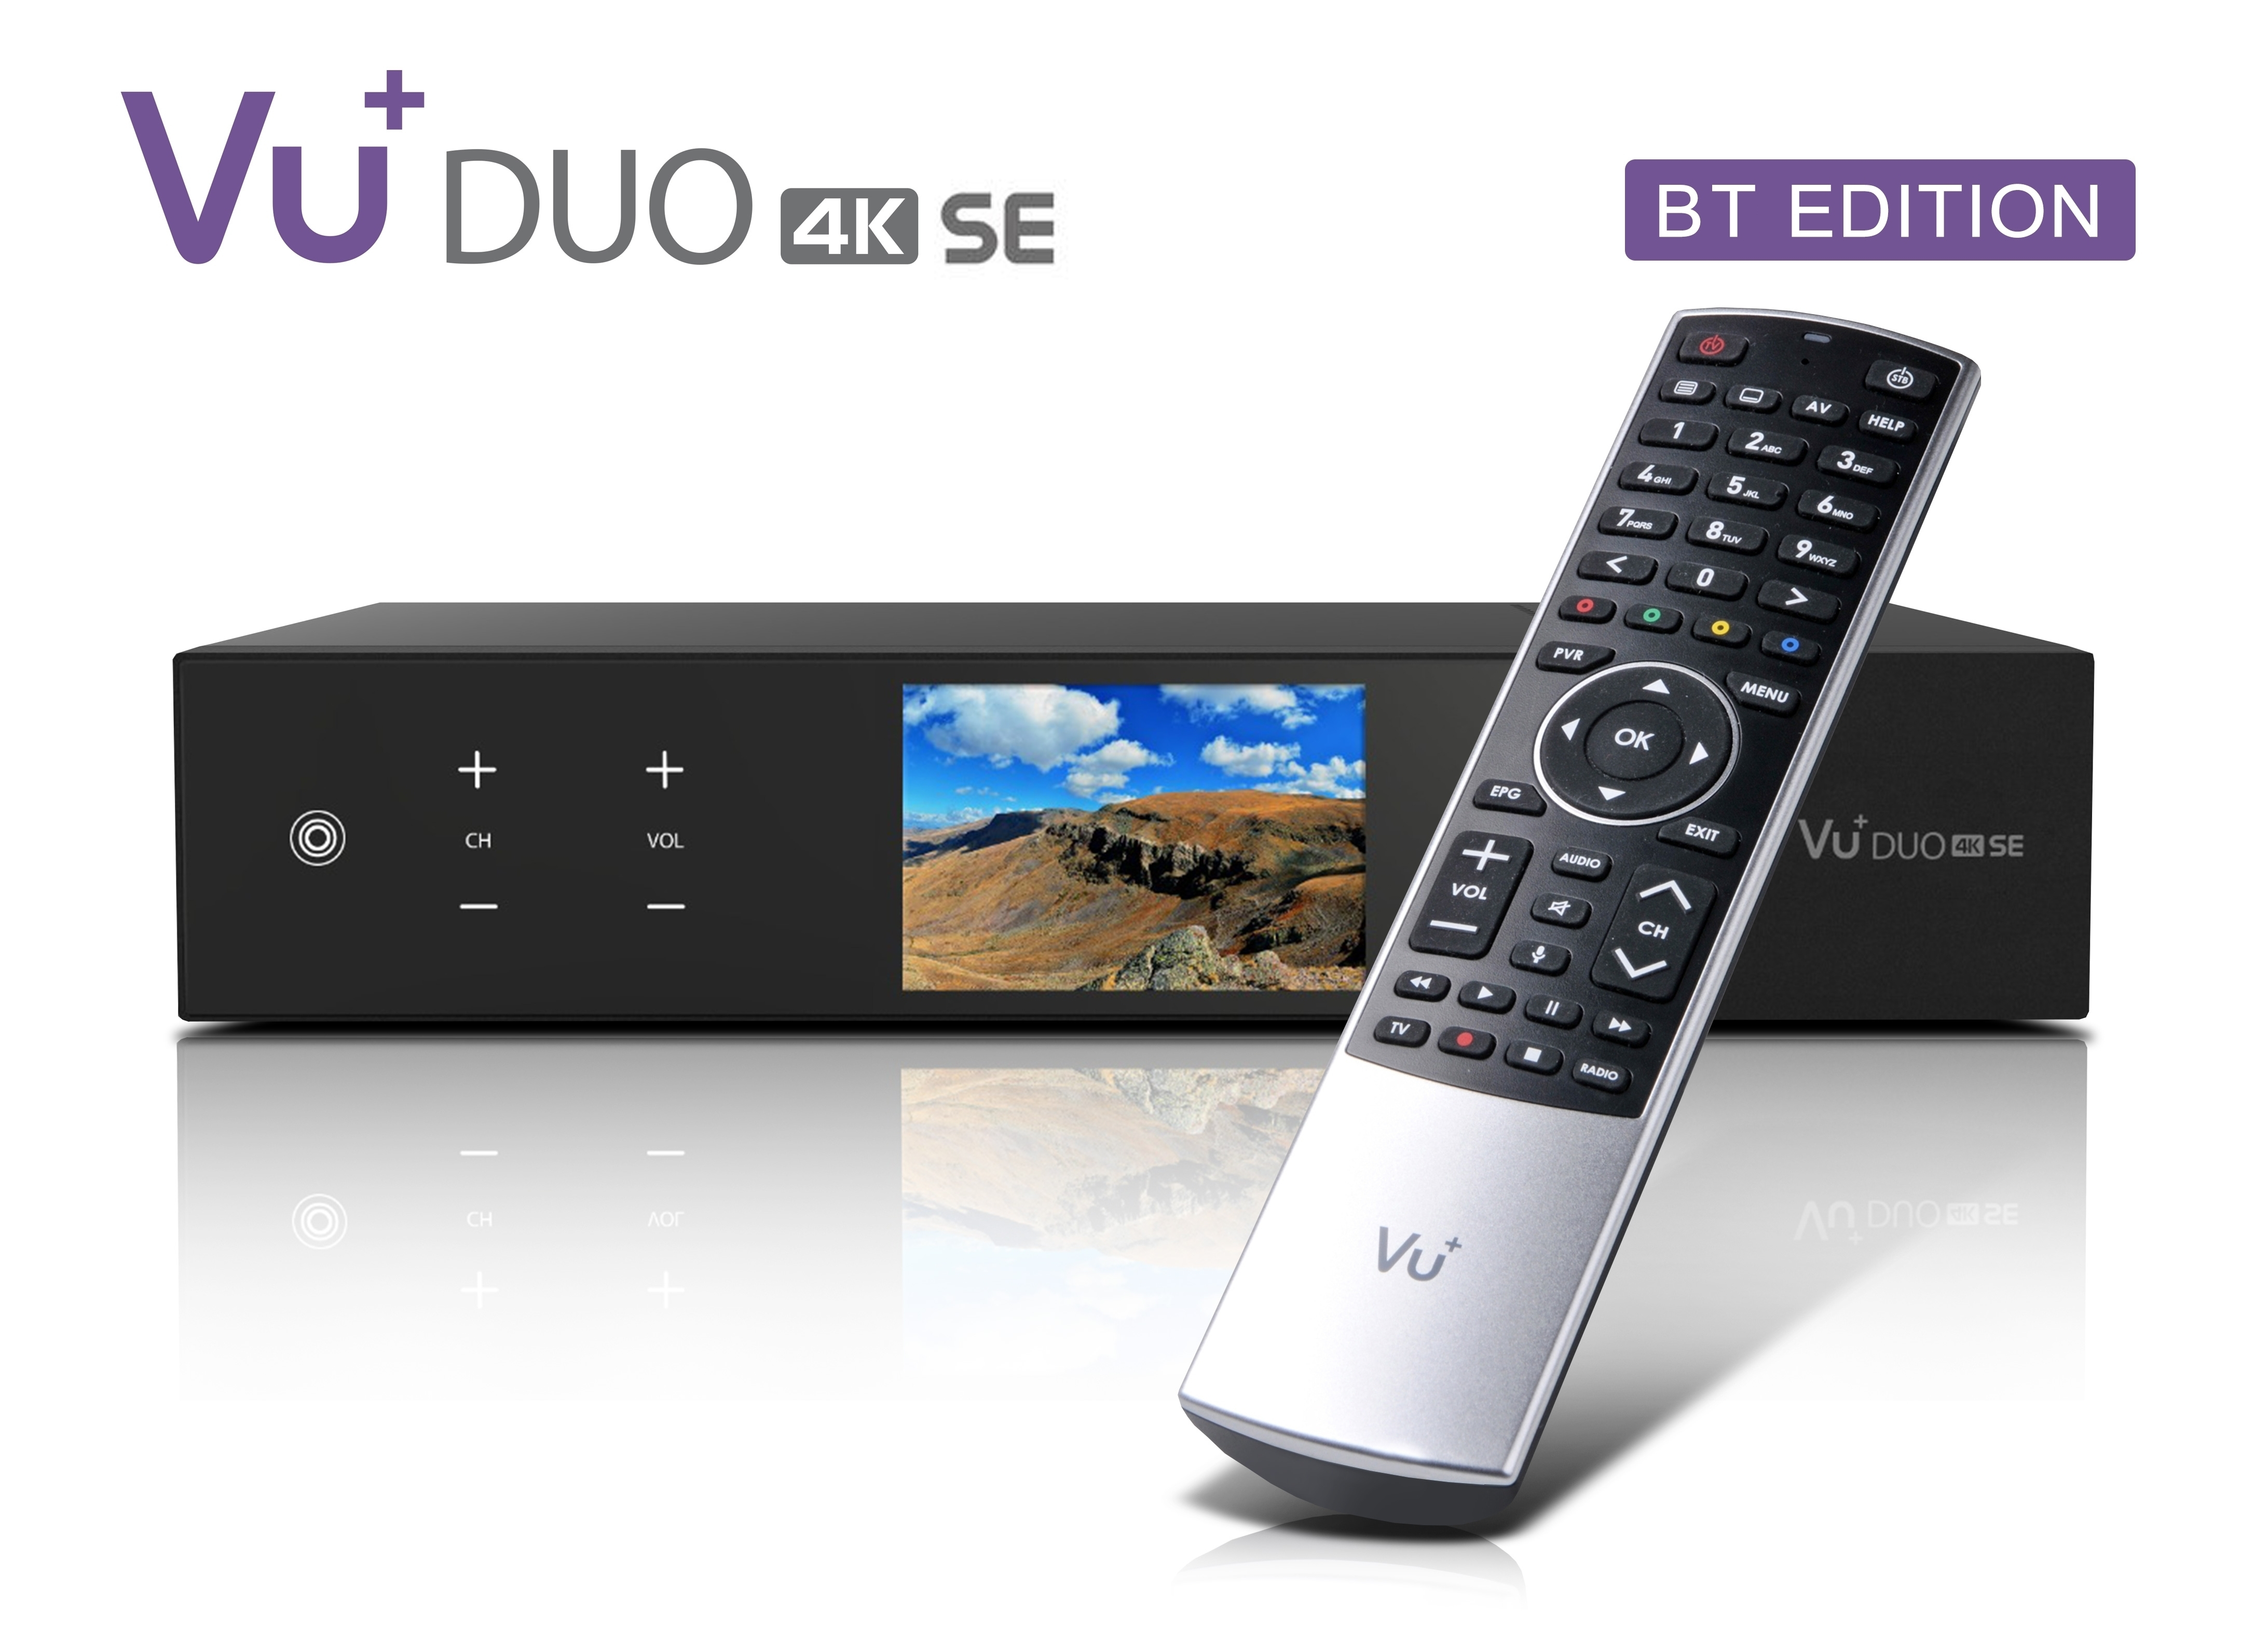 VU+ Duo 4K SE BT 1x DVB-S2X FBC Twin / 1x DVB-C FBC Tuner 500 GB HDD Linux Receiver UHD 2160p